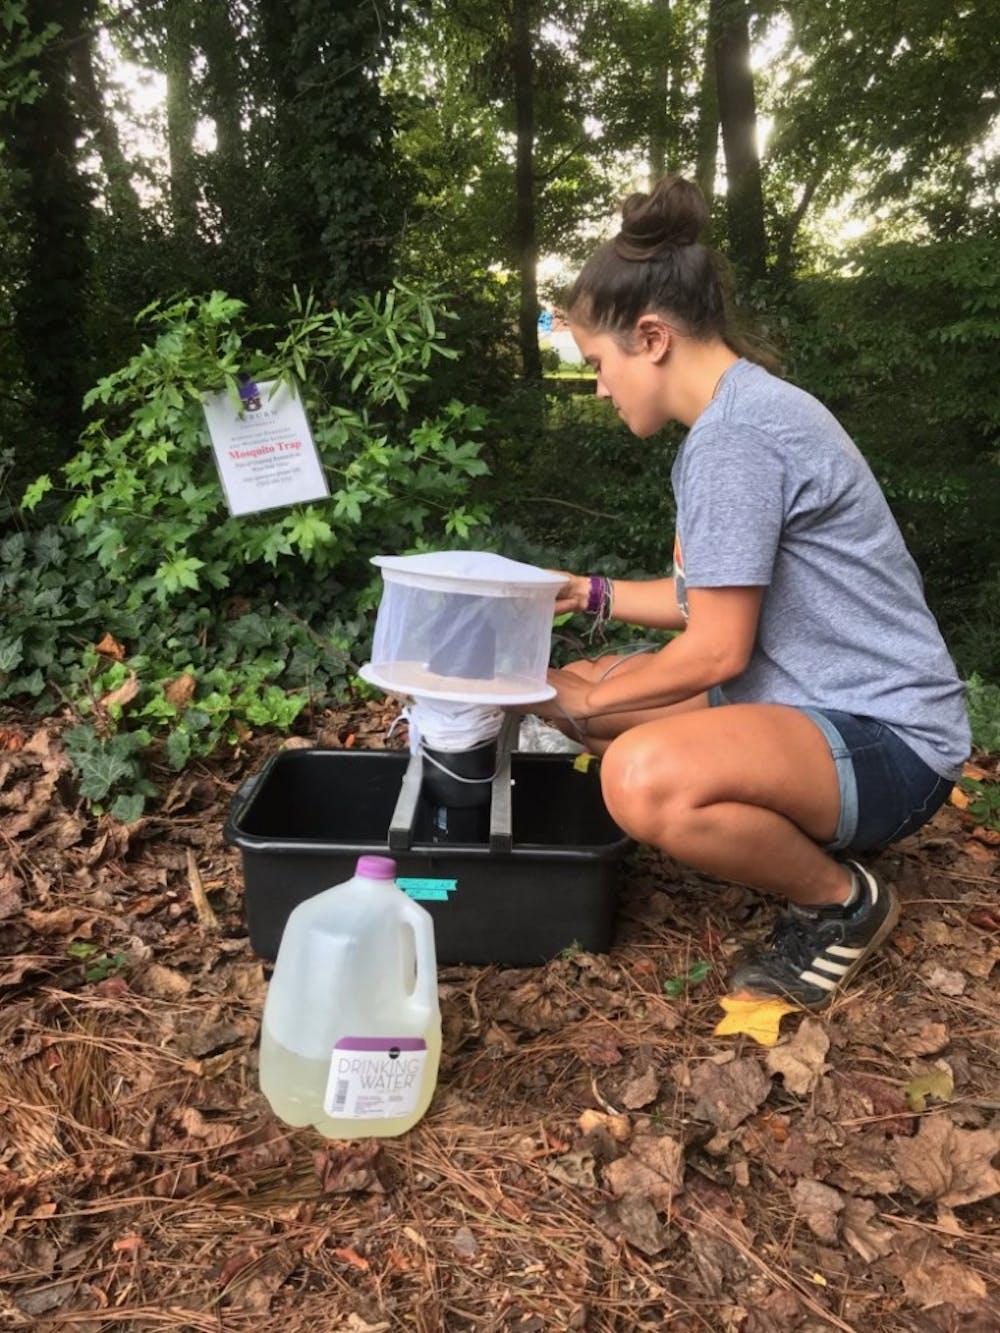 Auburn researchers partner with Atlanta Audubon Society to gain better understanding of West Nile virus